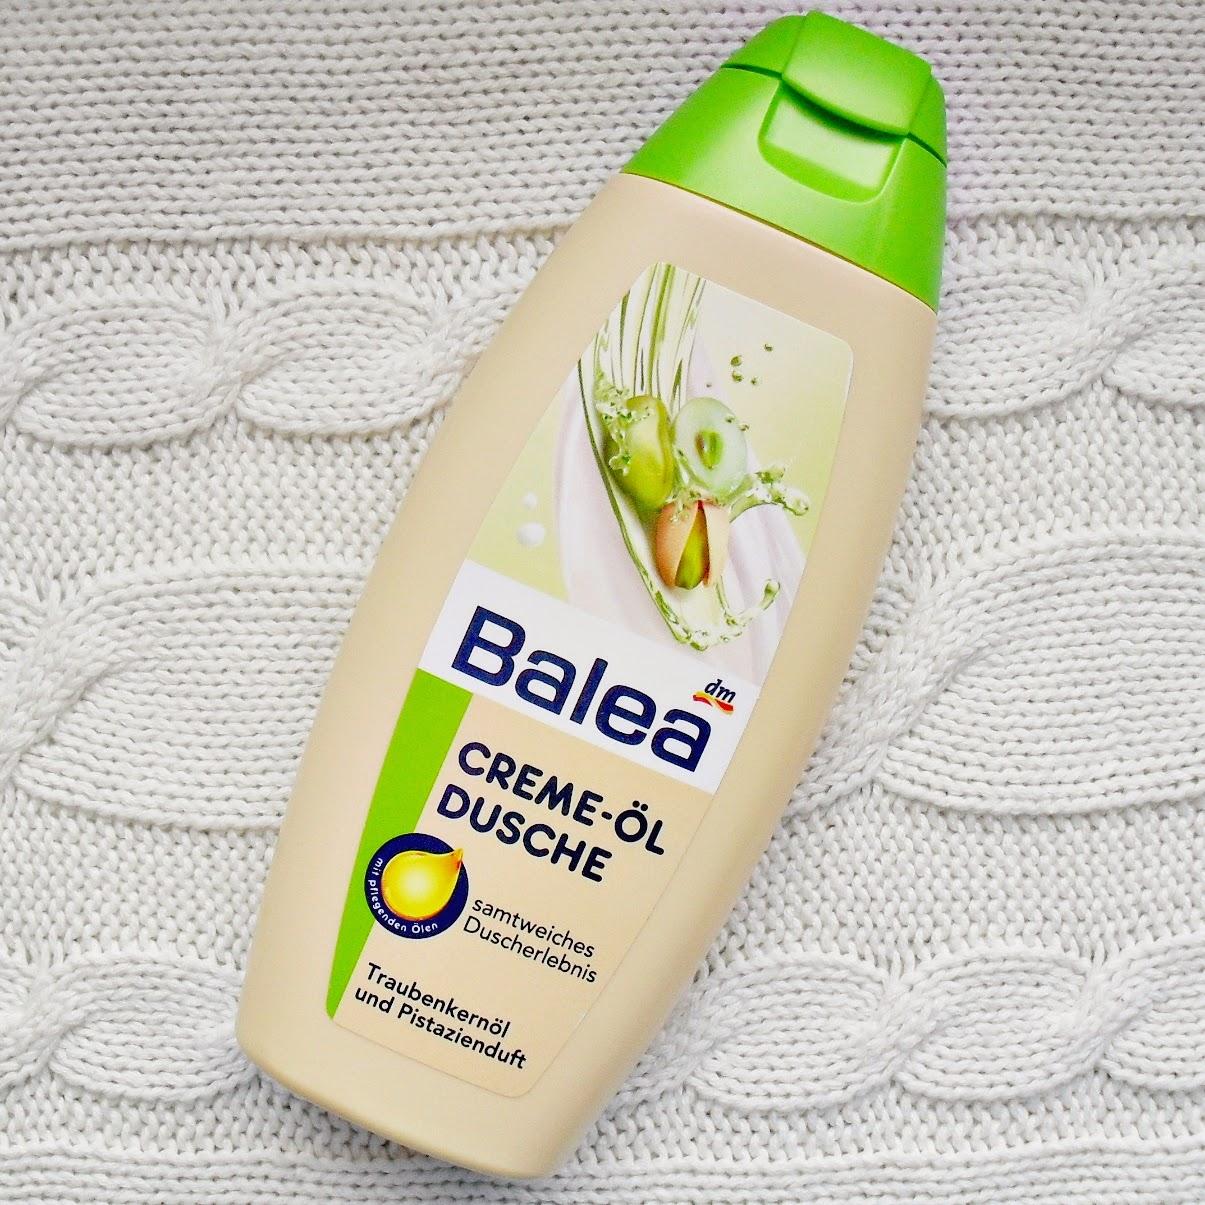 BALEA | Creme-ol dusche